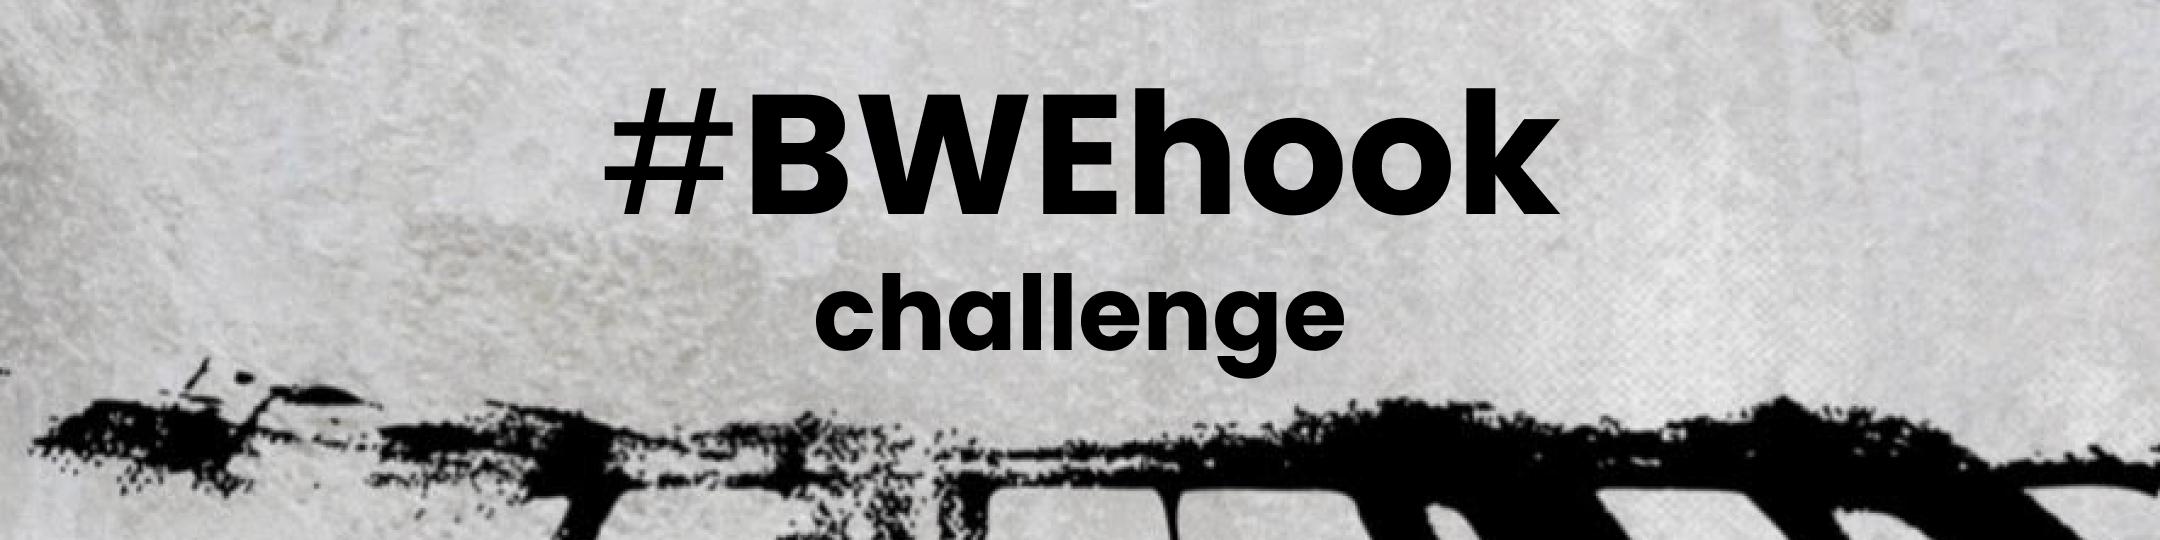 #bwehook Graphic